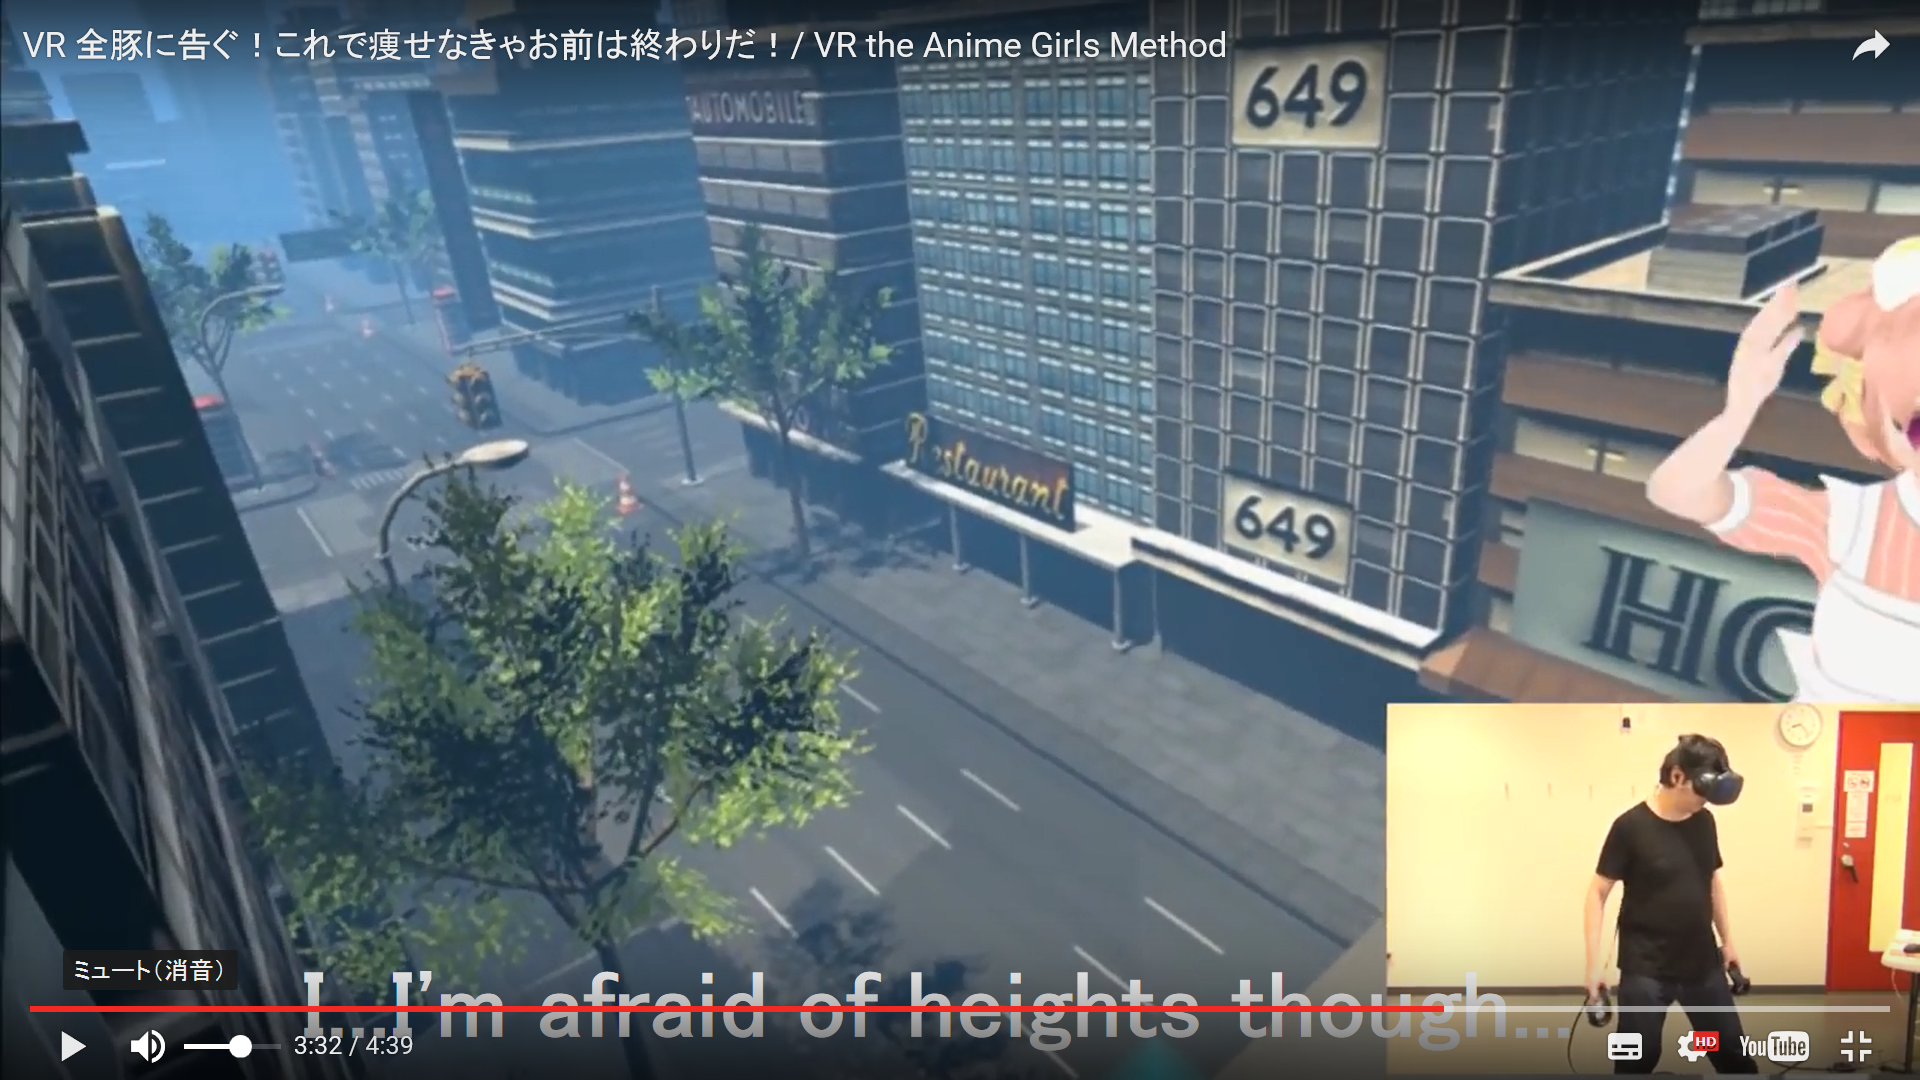 VRゲームデモ画面